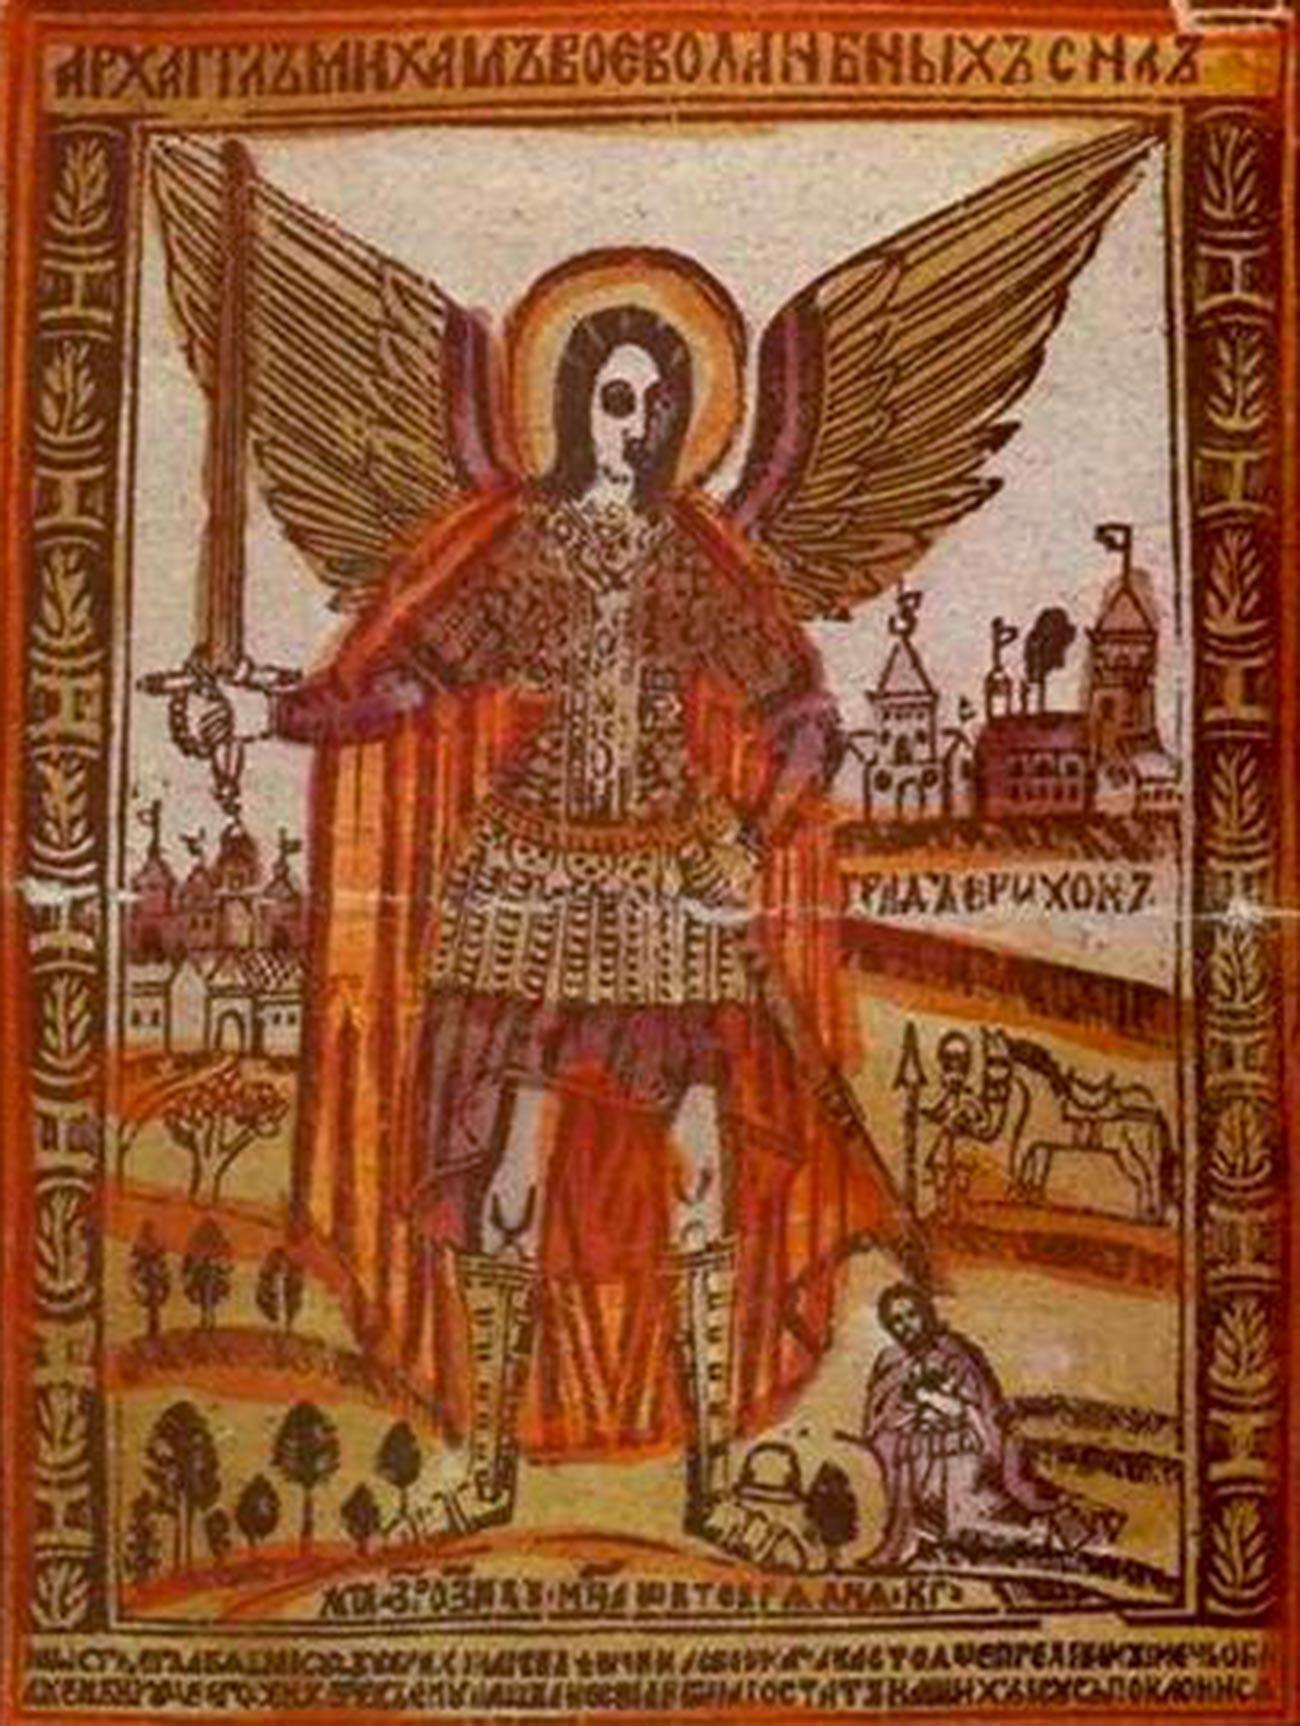 Лубок «Архангел Михаил», неизвестный автор, 1668 год.